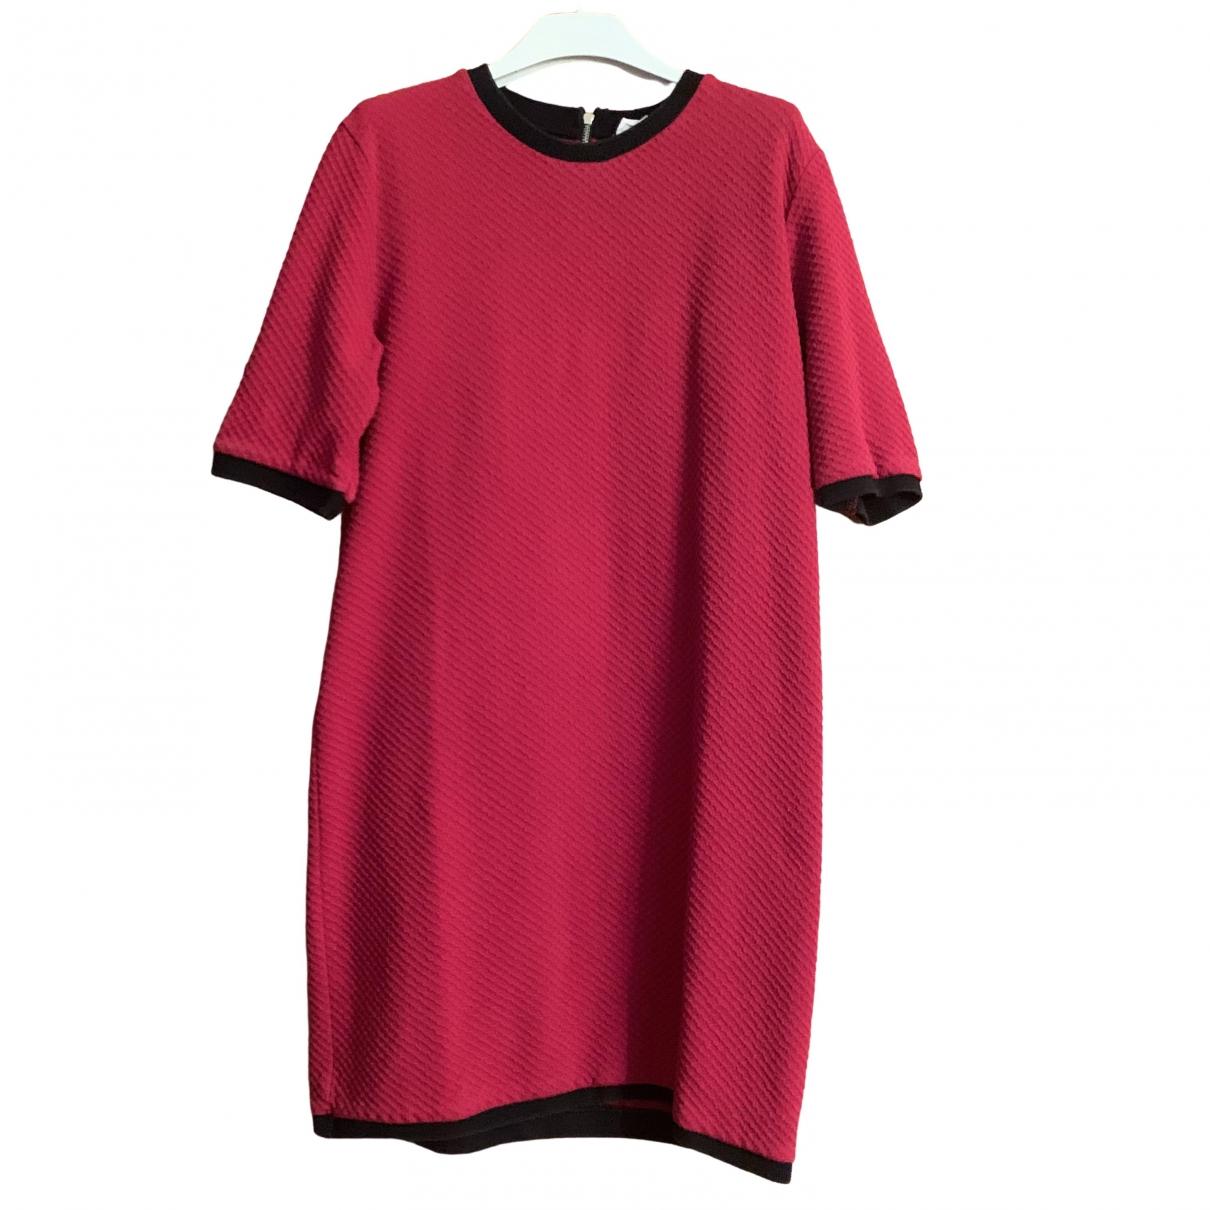 Zara \N Kleid in  Rot Synthetik